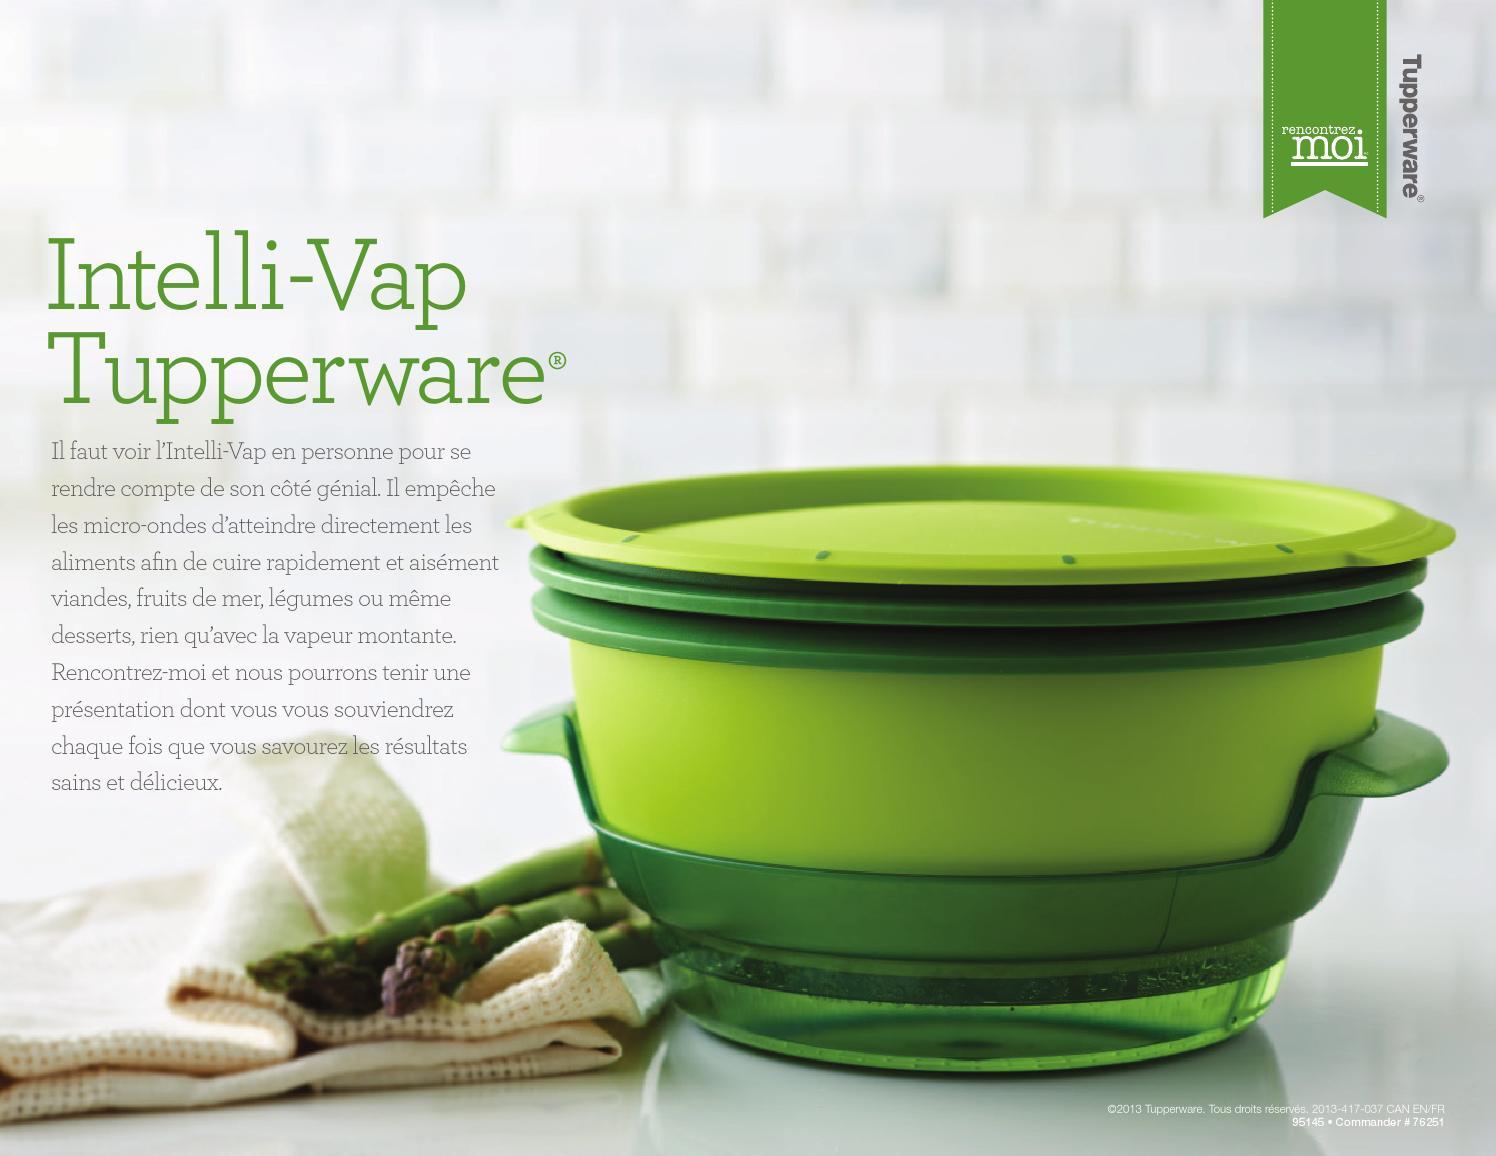 Rencontrez moi intelli vap tupperware by manon crevier - Plat micro onde tupperware ...